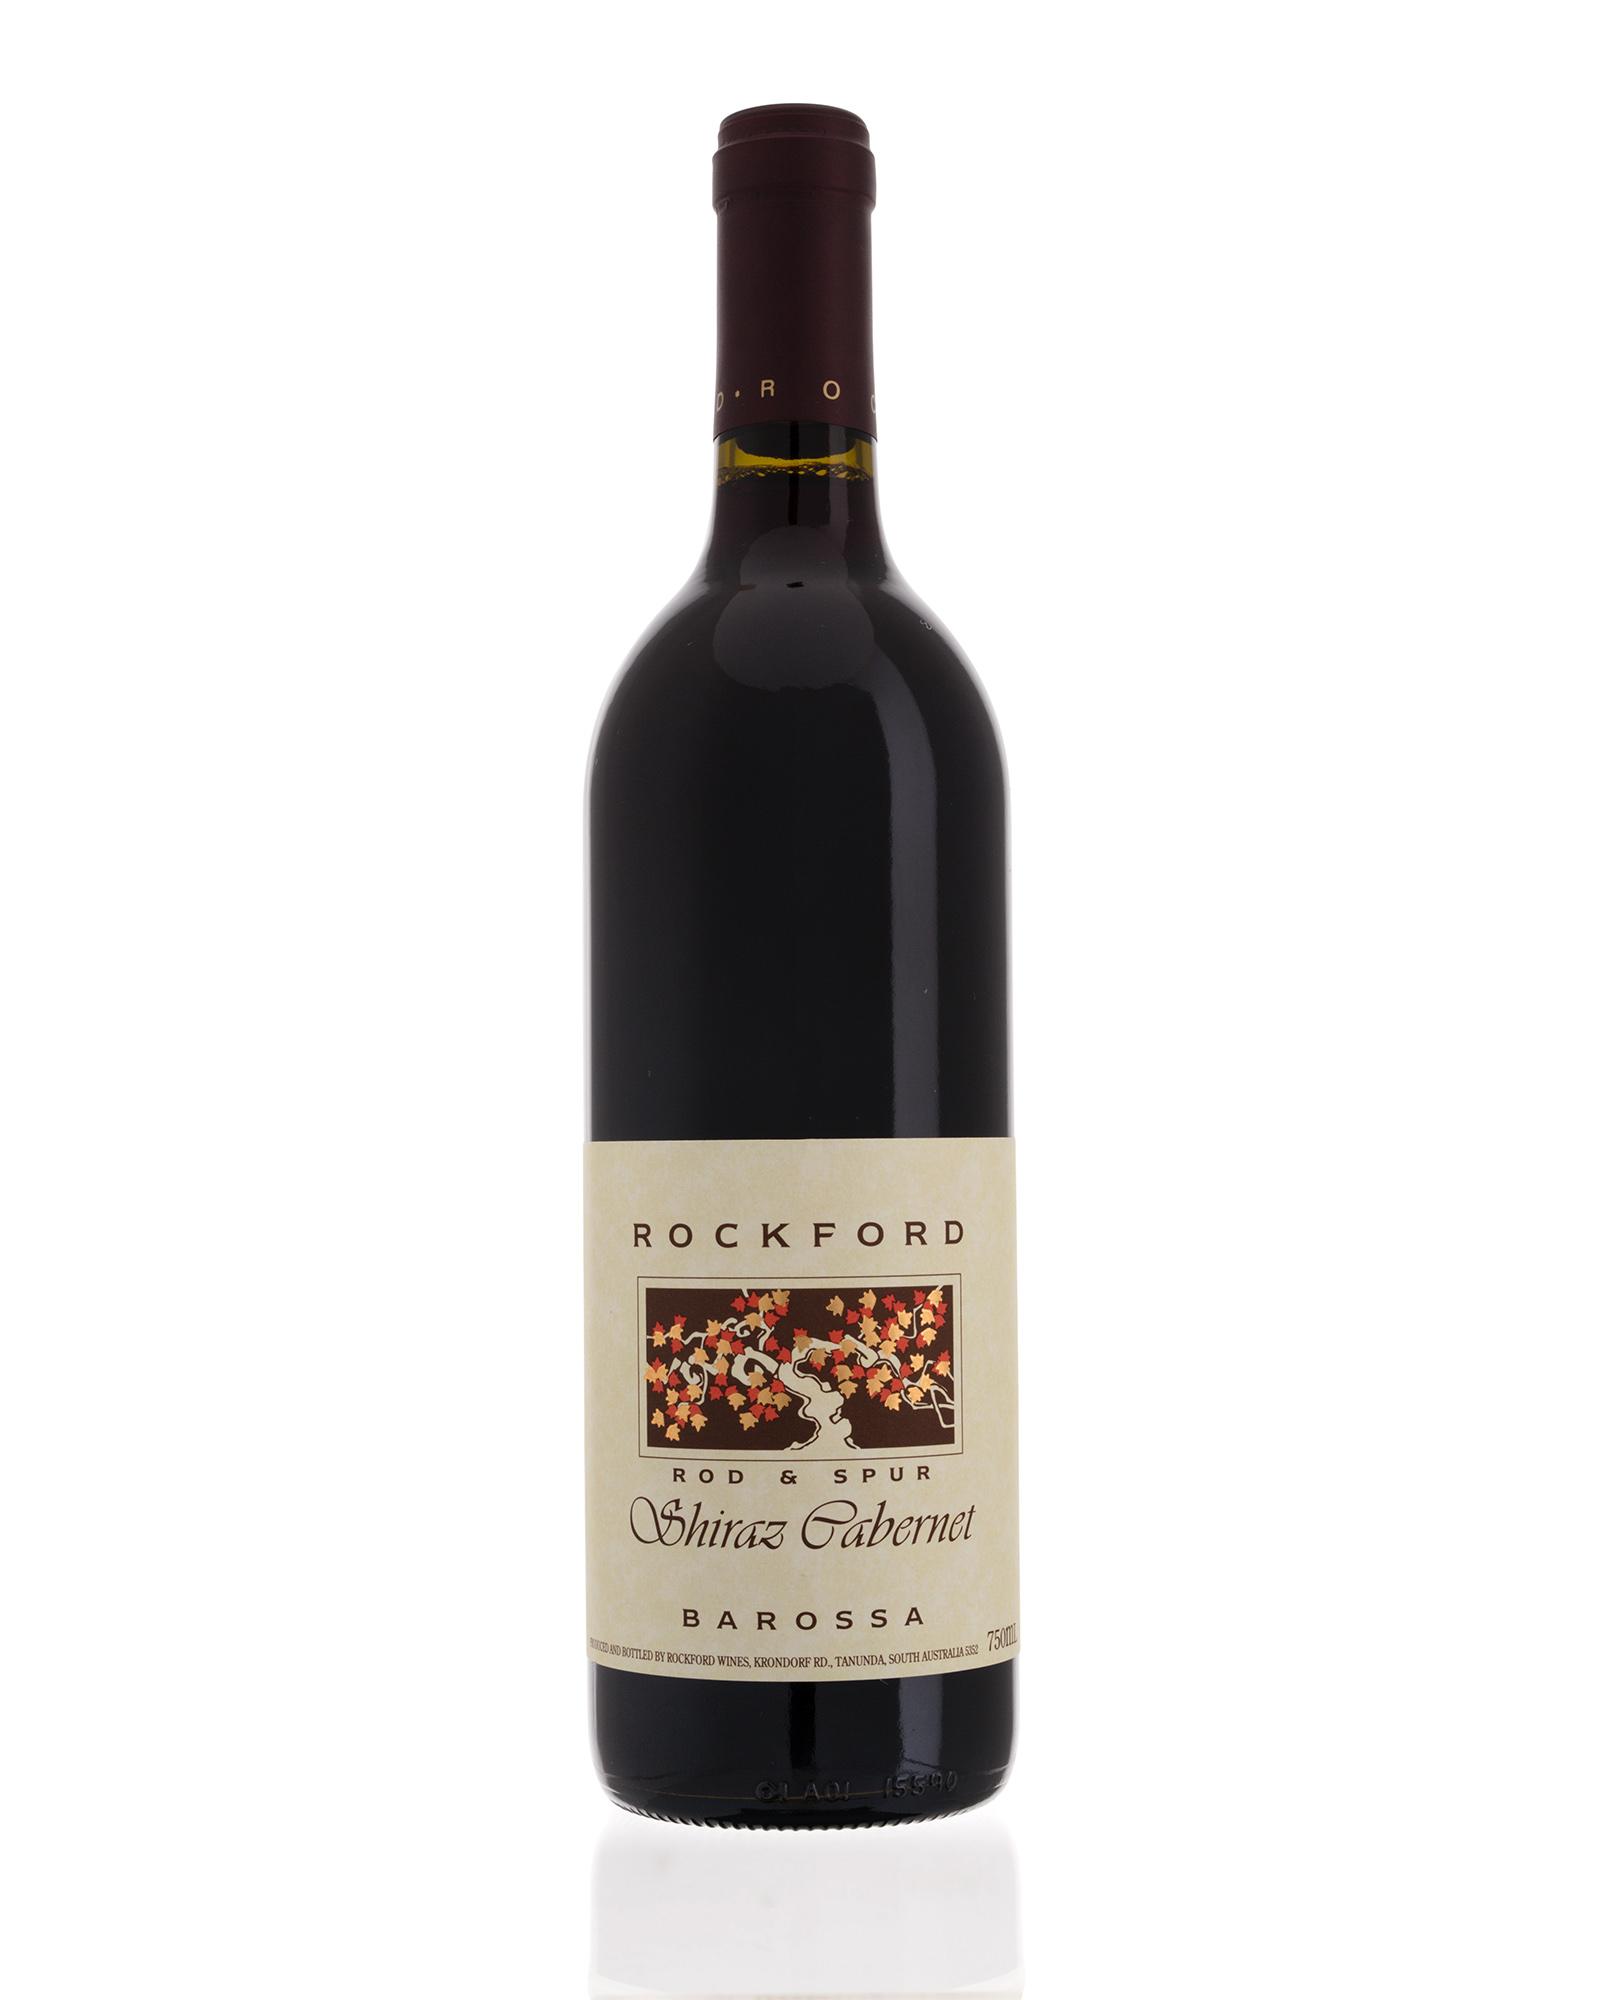 vins étrangers Rockford Wines Shiraz cabernet Australie